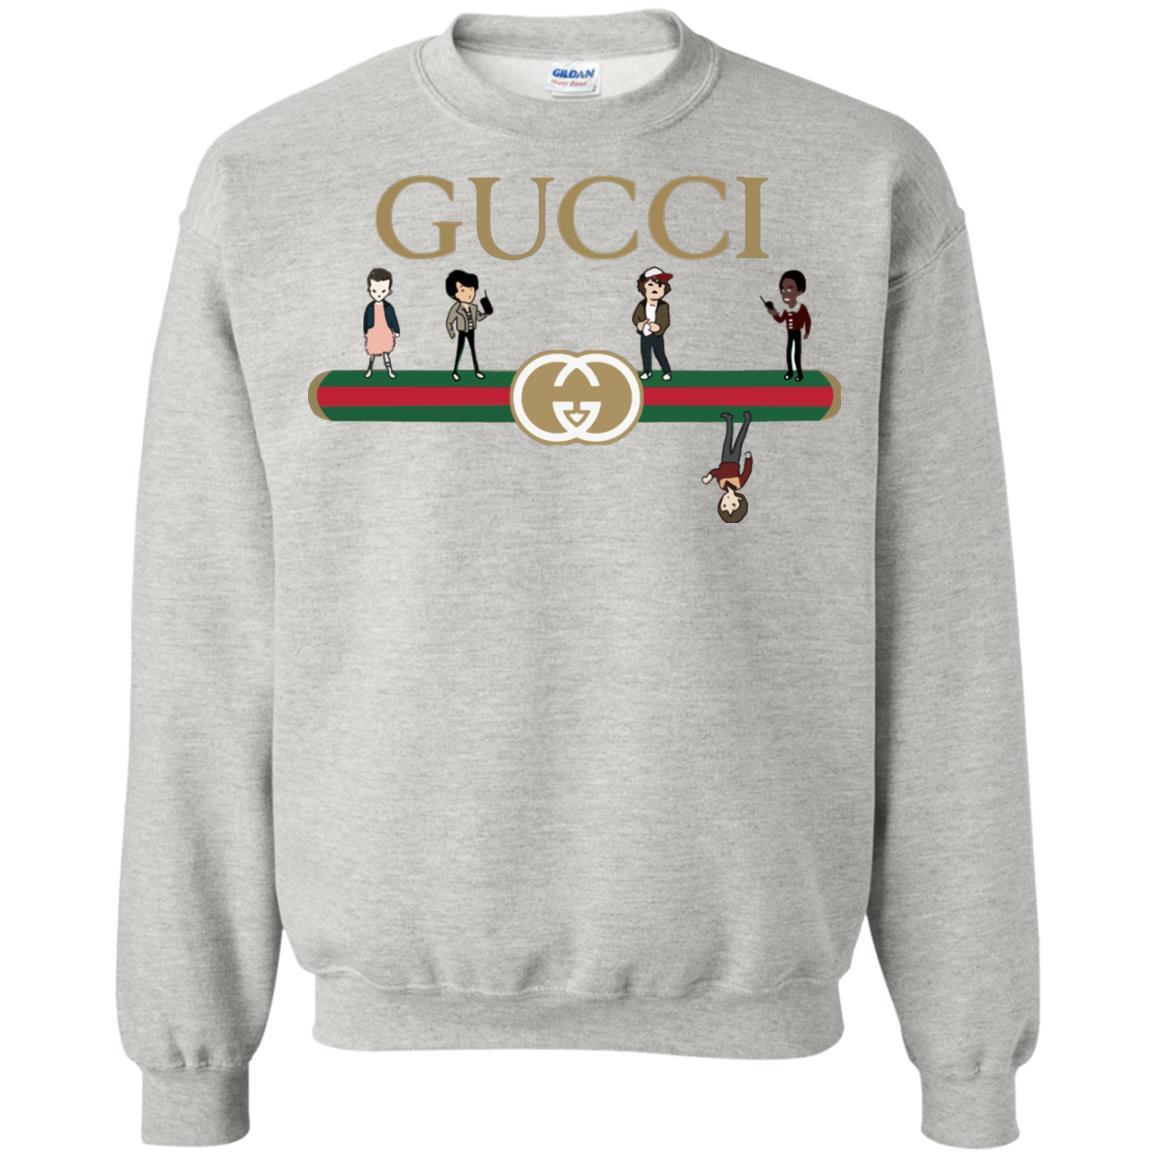 Gucci Stranger Things Sweater Shirt Amp Hoodie Rockatee